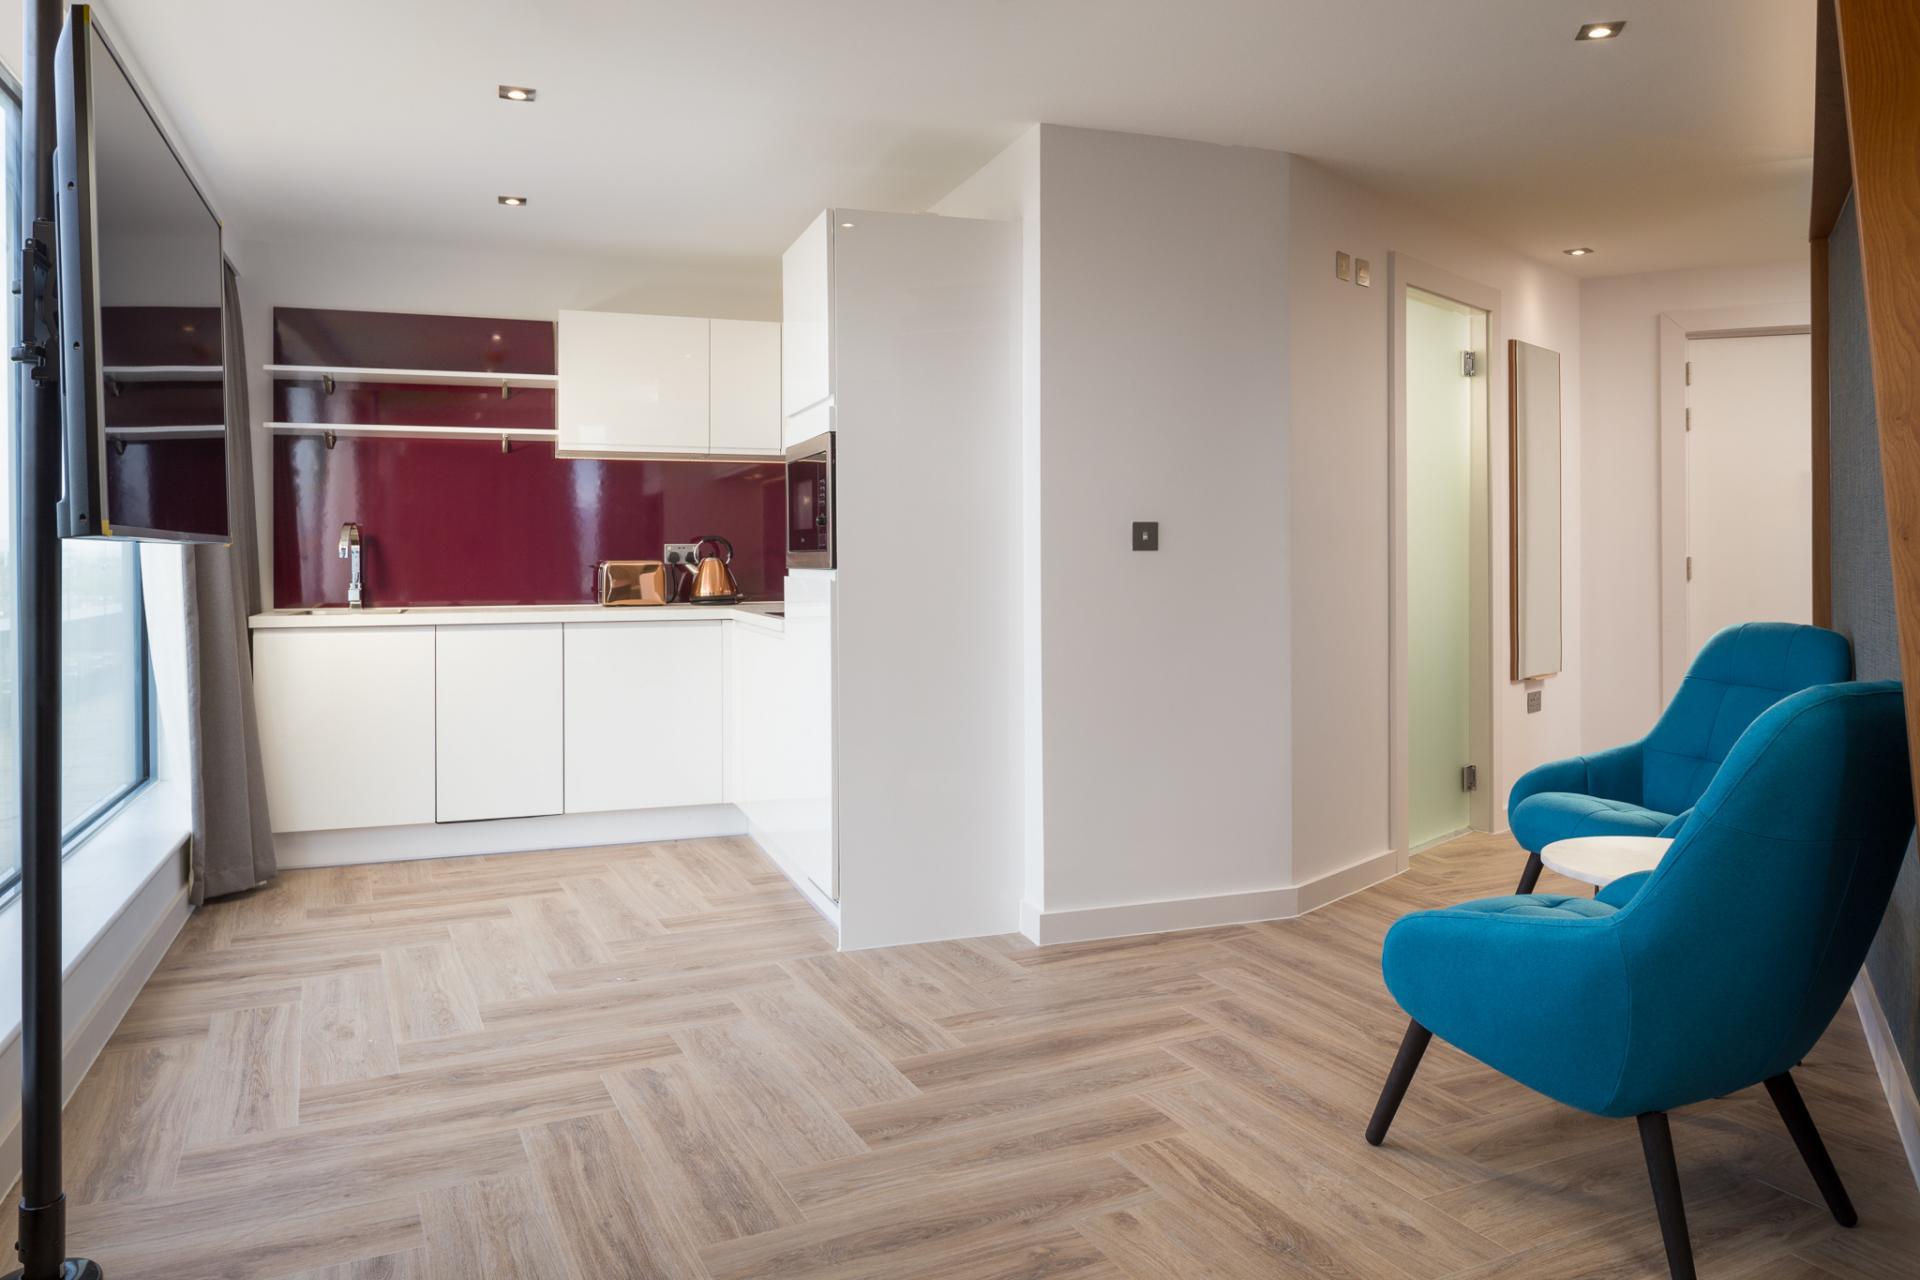 Dezign kitchen at  Roomzzz London Stratford - Citybase Apartments